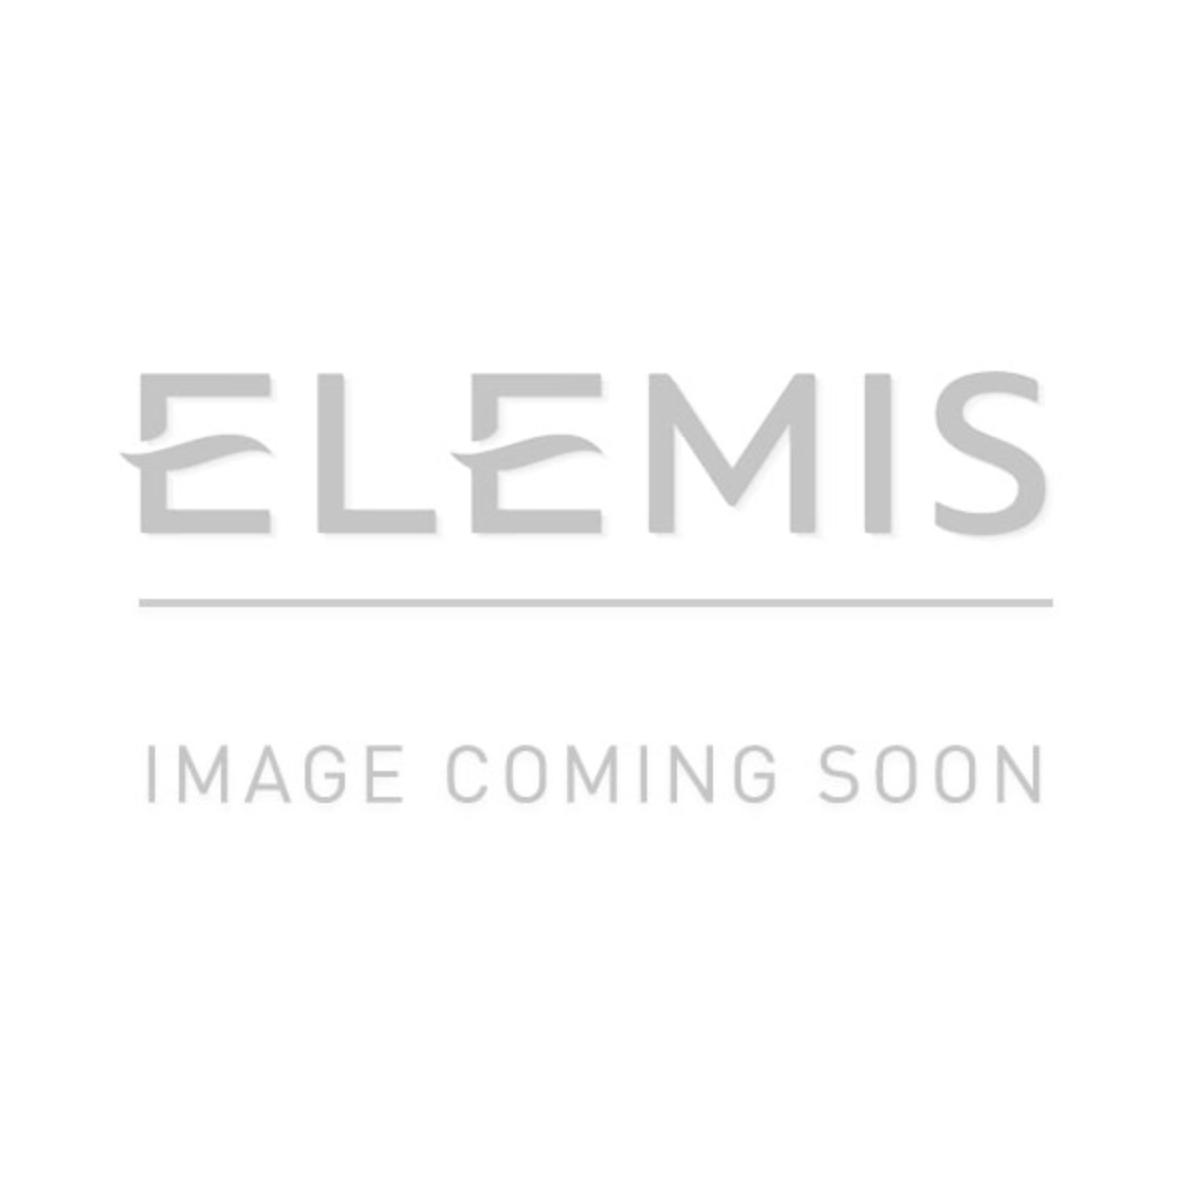 Elemis revitalise me shower gel 200ml elemis - Elemis shower gel ...